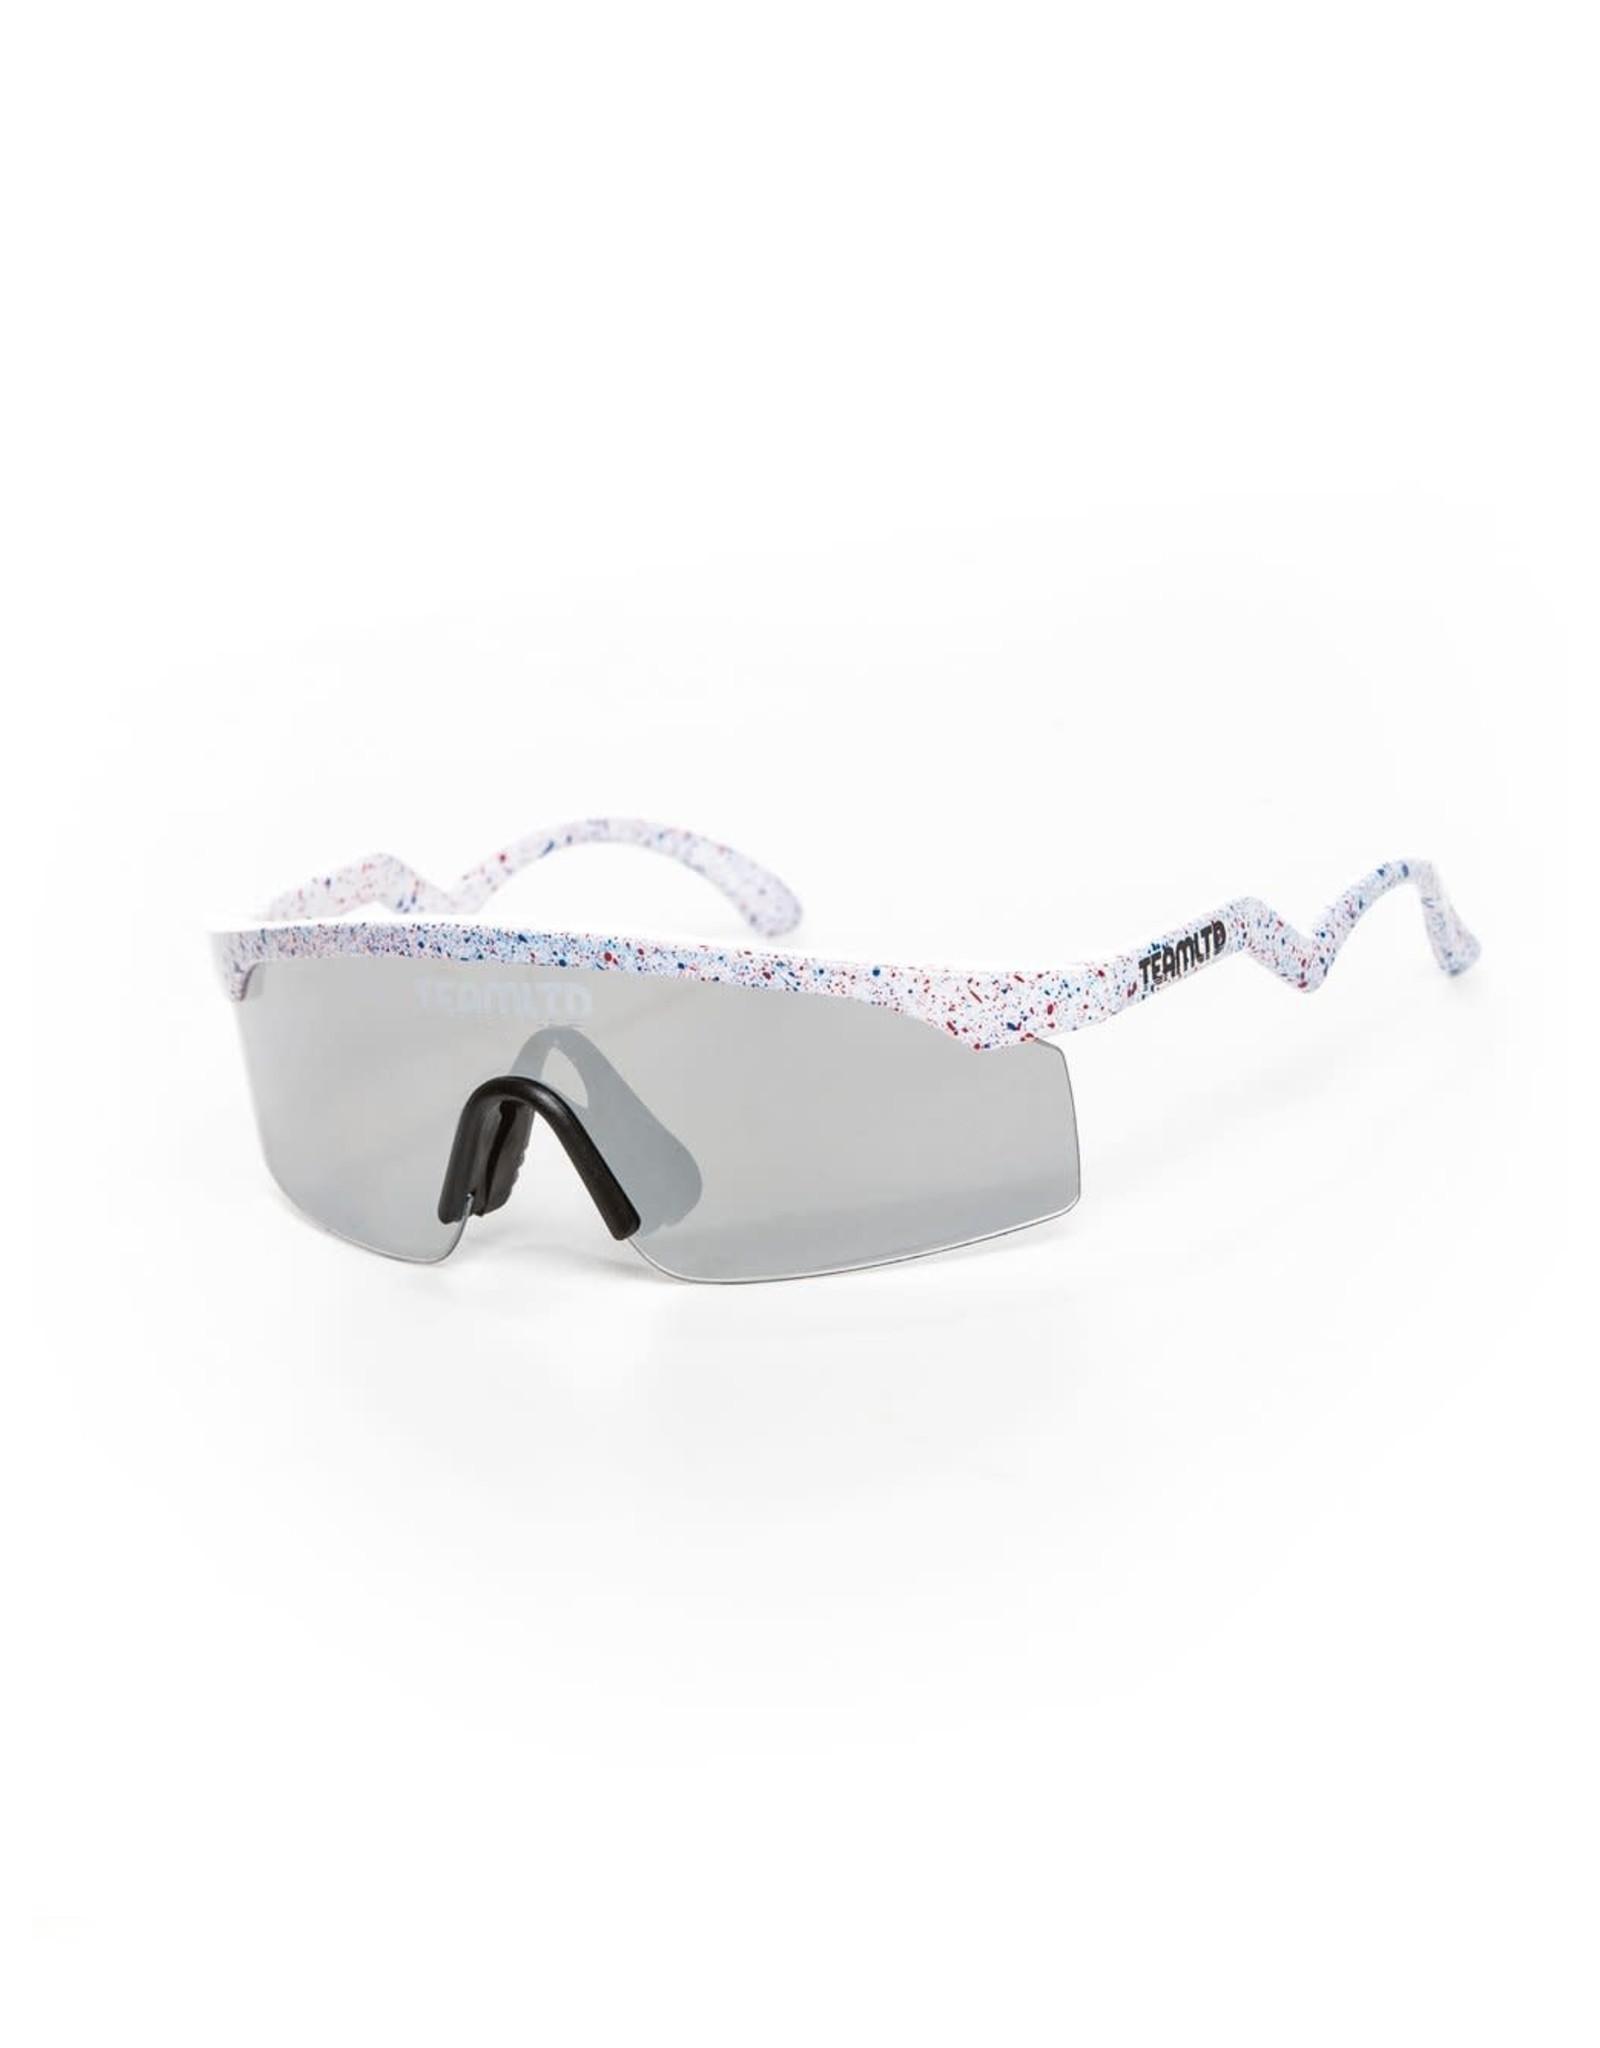 Team LTD Thrasher Sunglasses